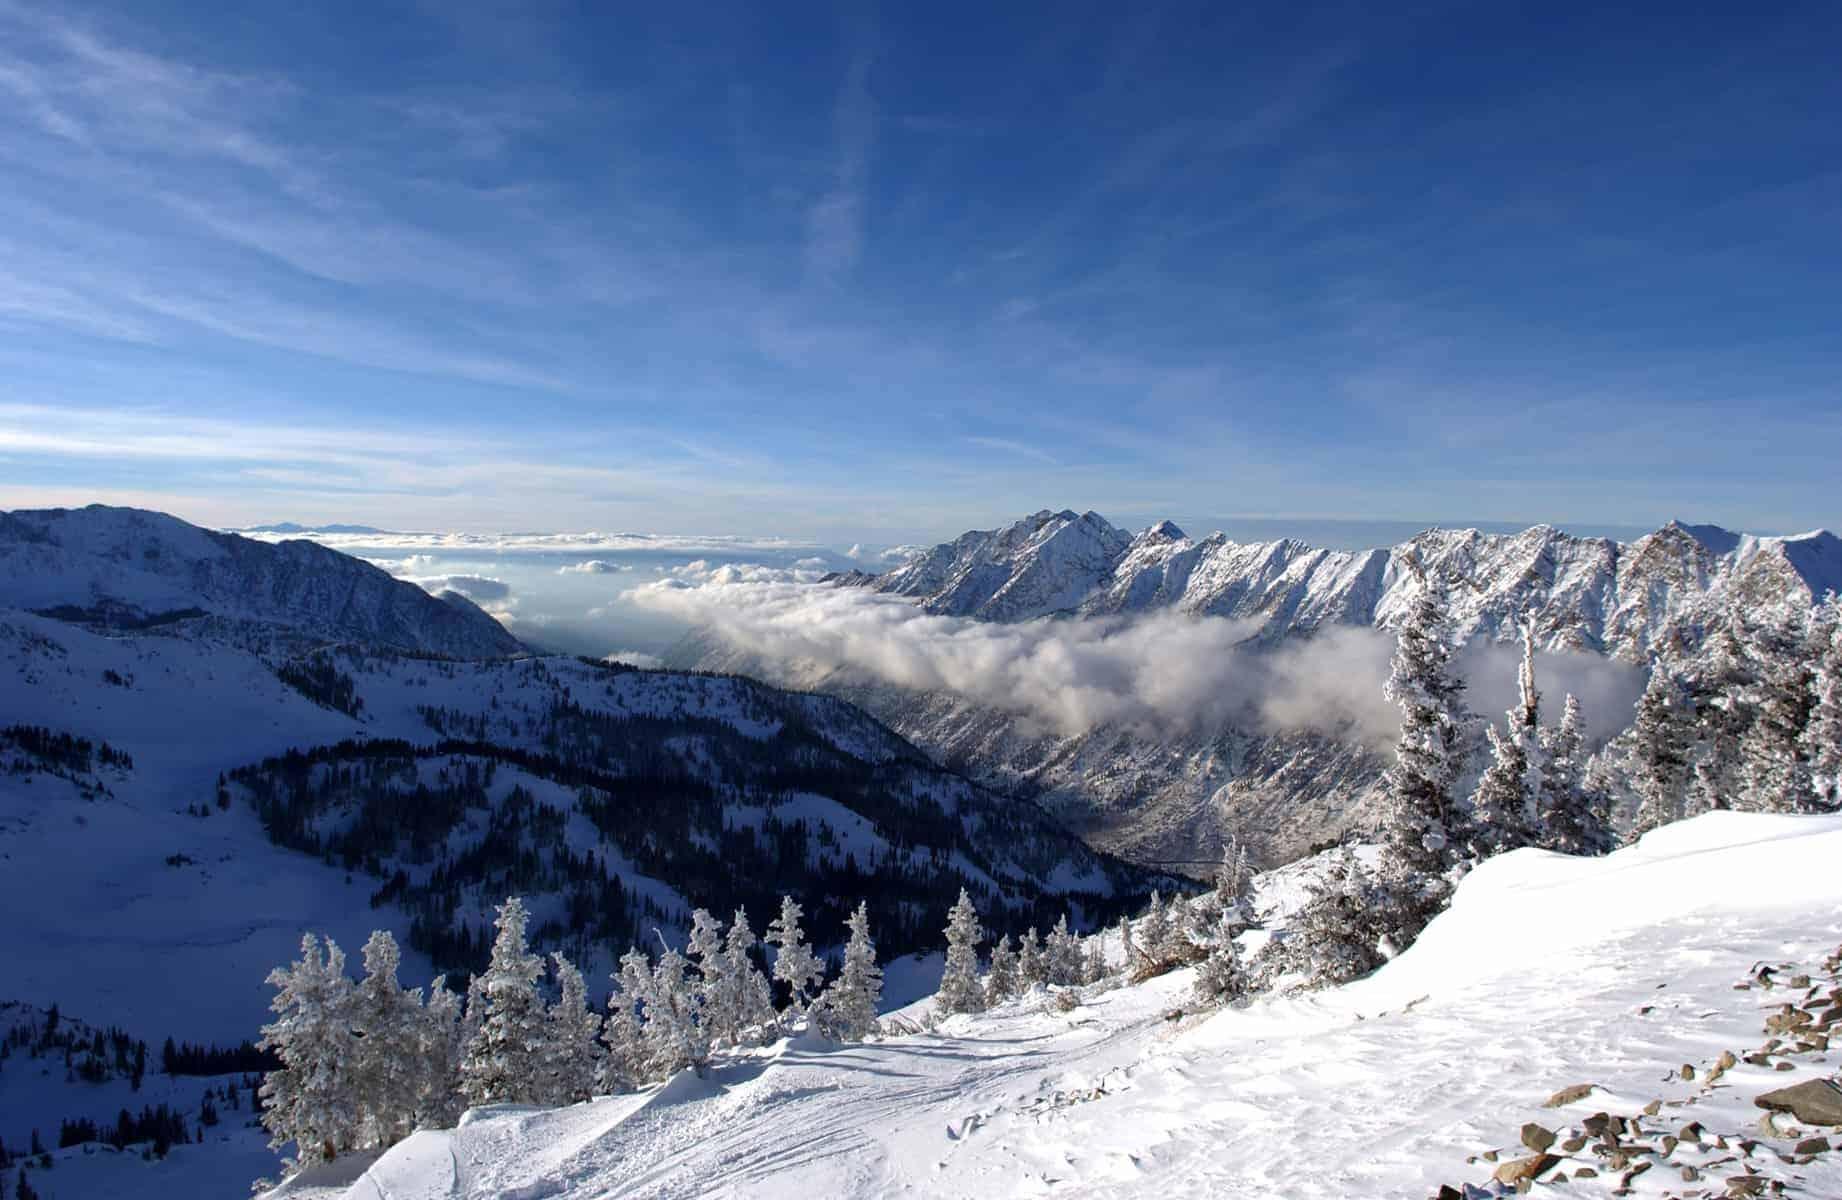 the Mountains from Snowbird ski resort in Utah, USA